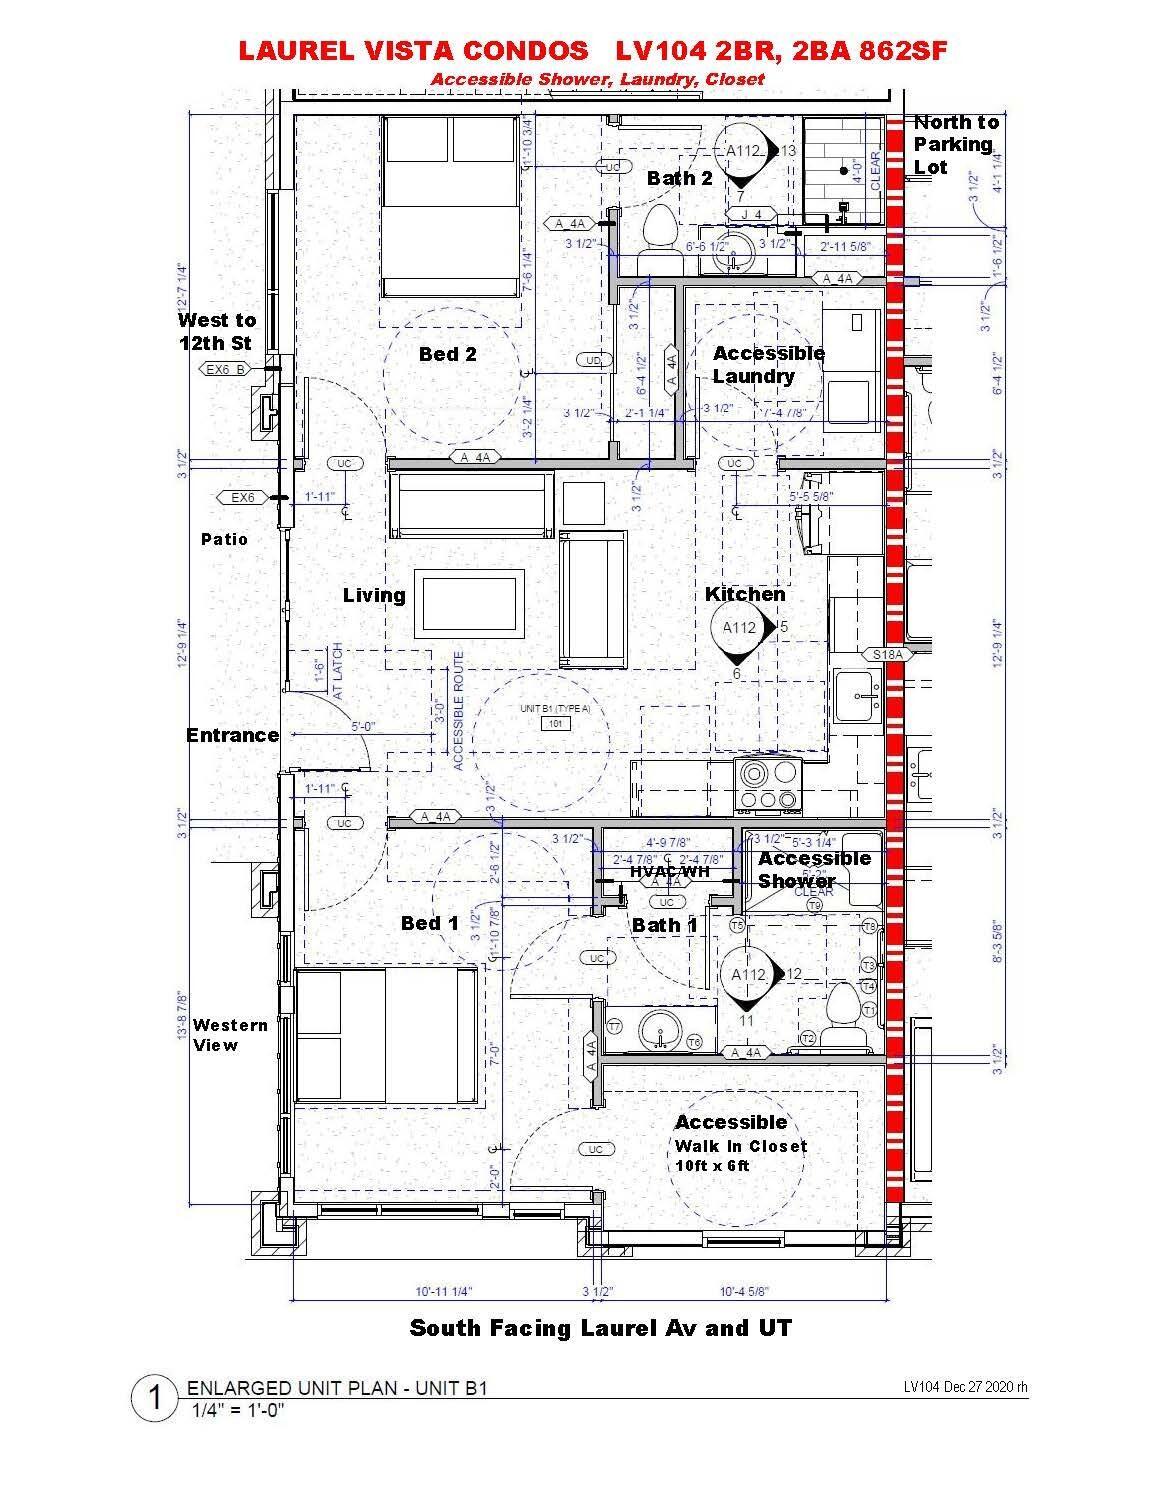 LV104 2BR,2BA - Floorplan 862SF